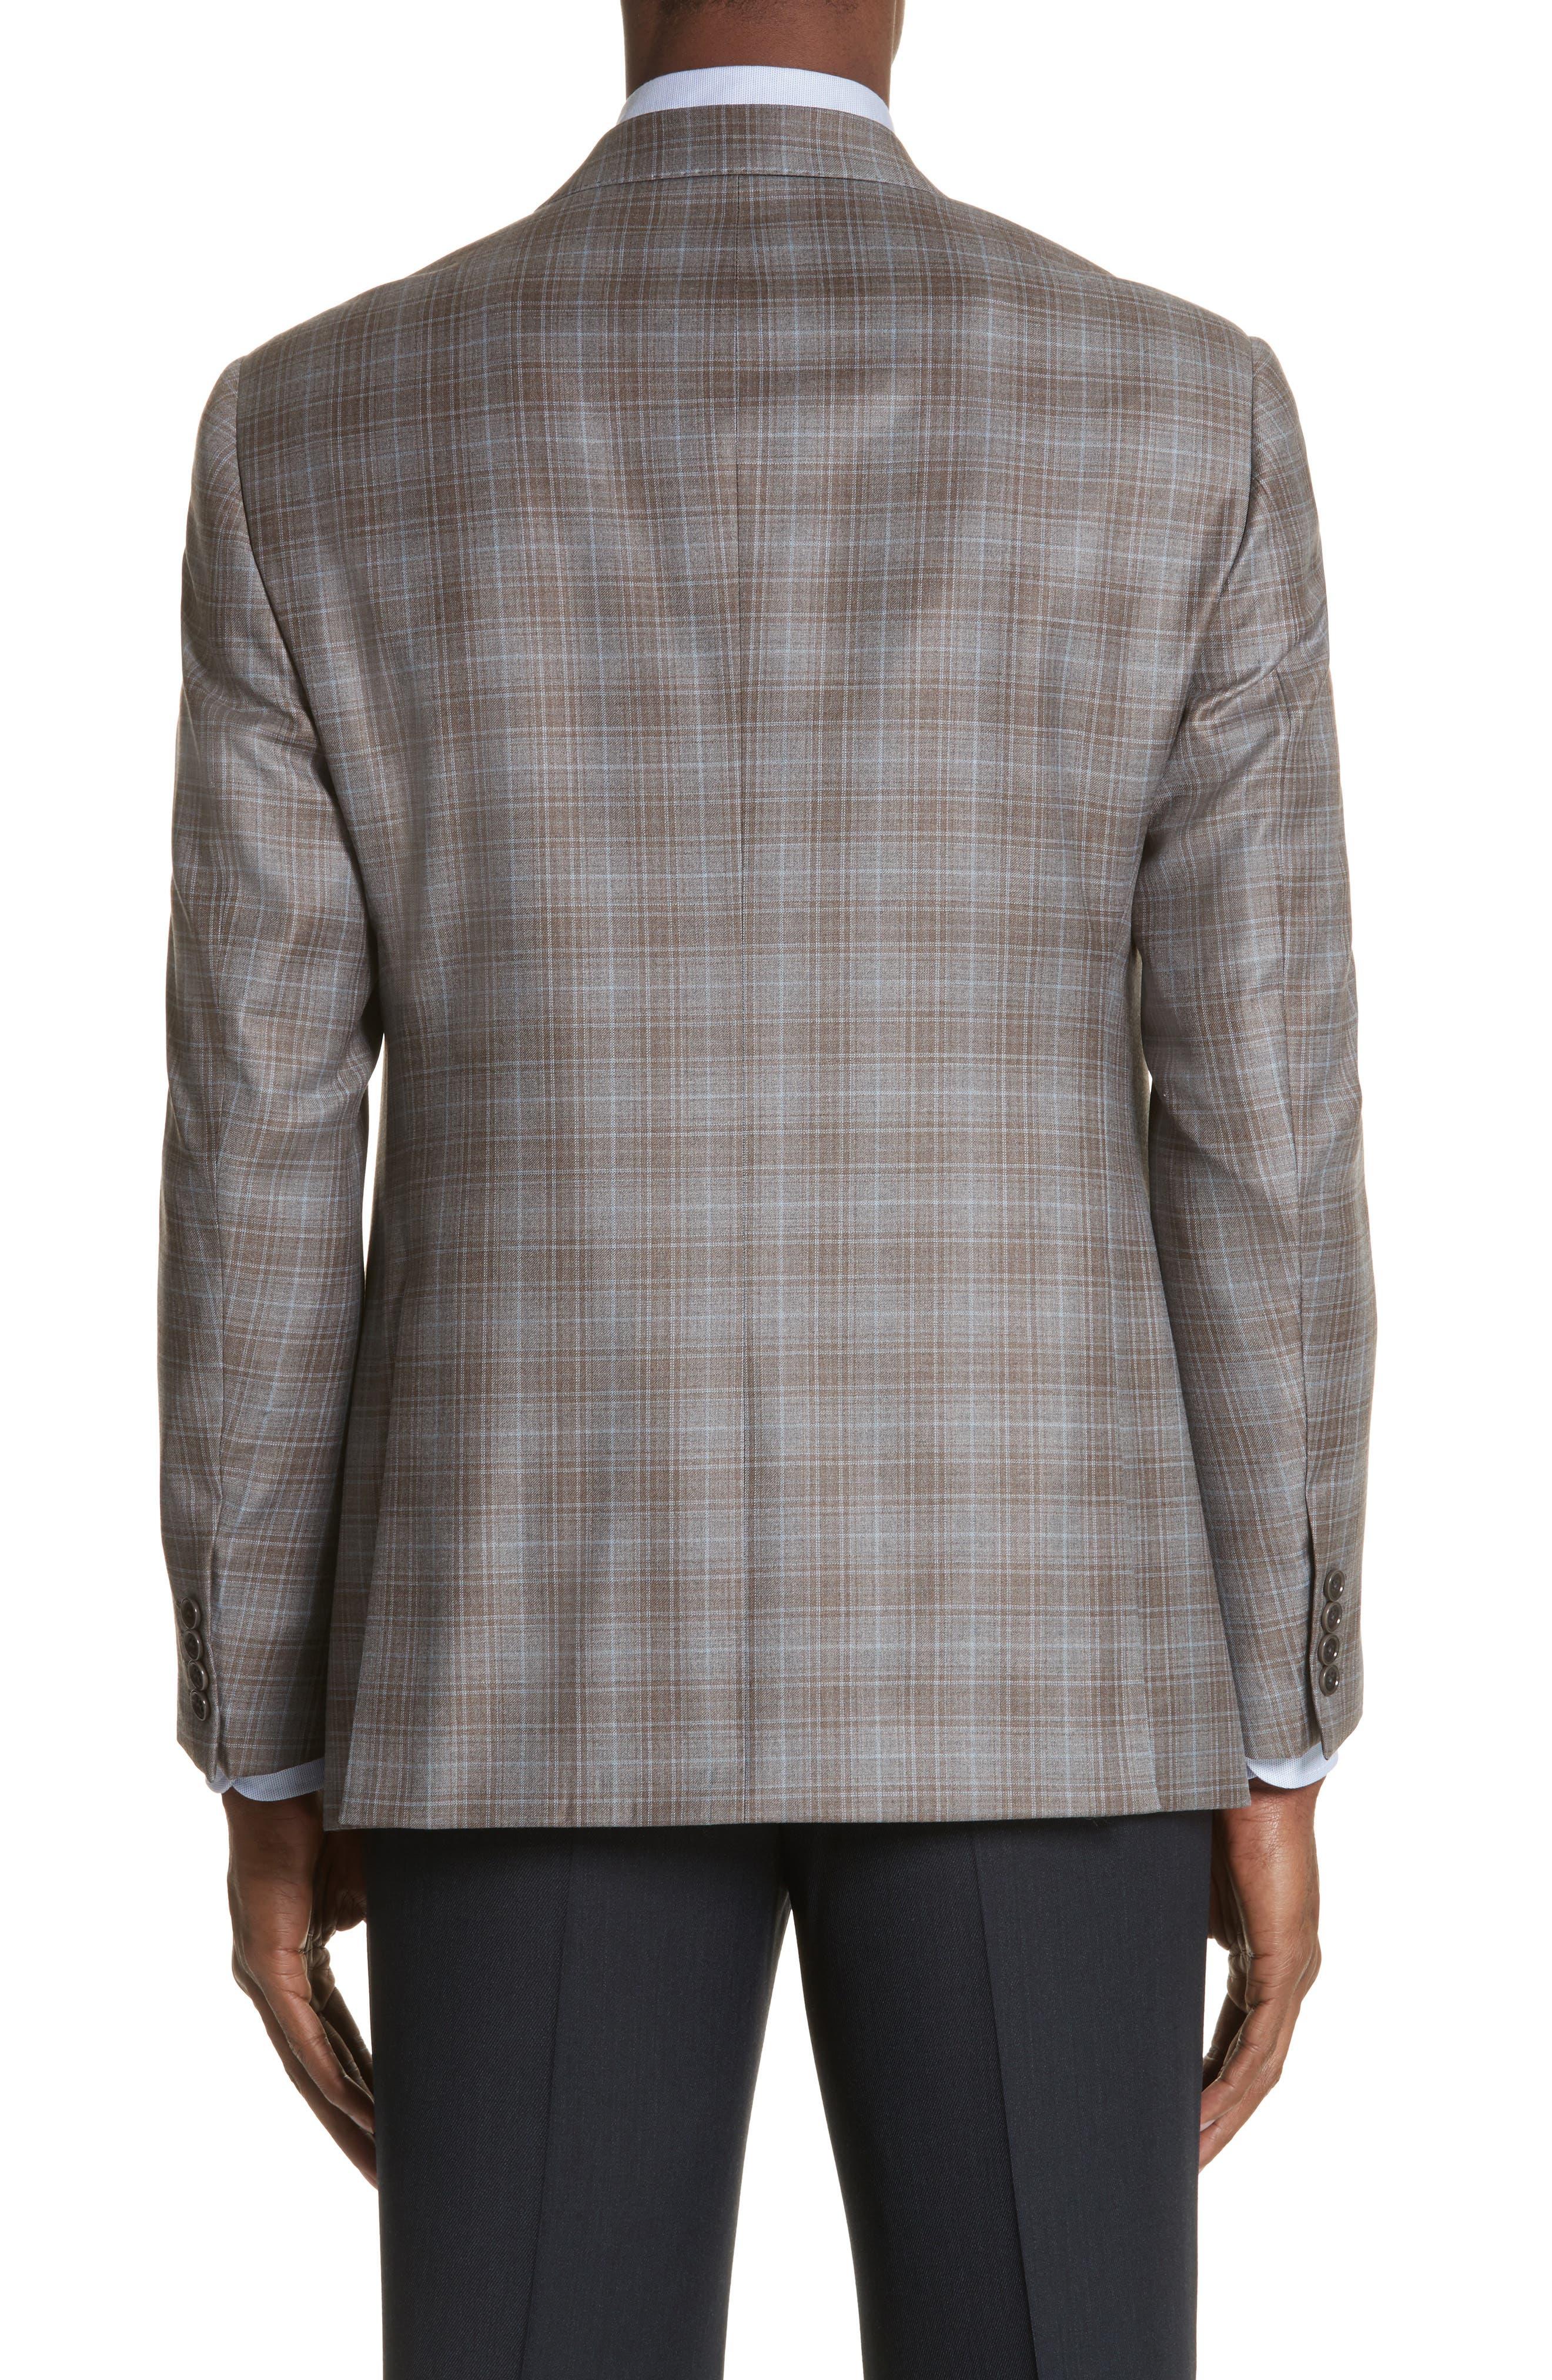 G-Line Trim Fit Plaid Wool Sport Coat,                             Alternate thumbnail 2, color,                             Tan